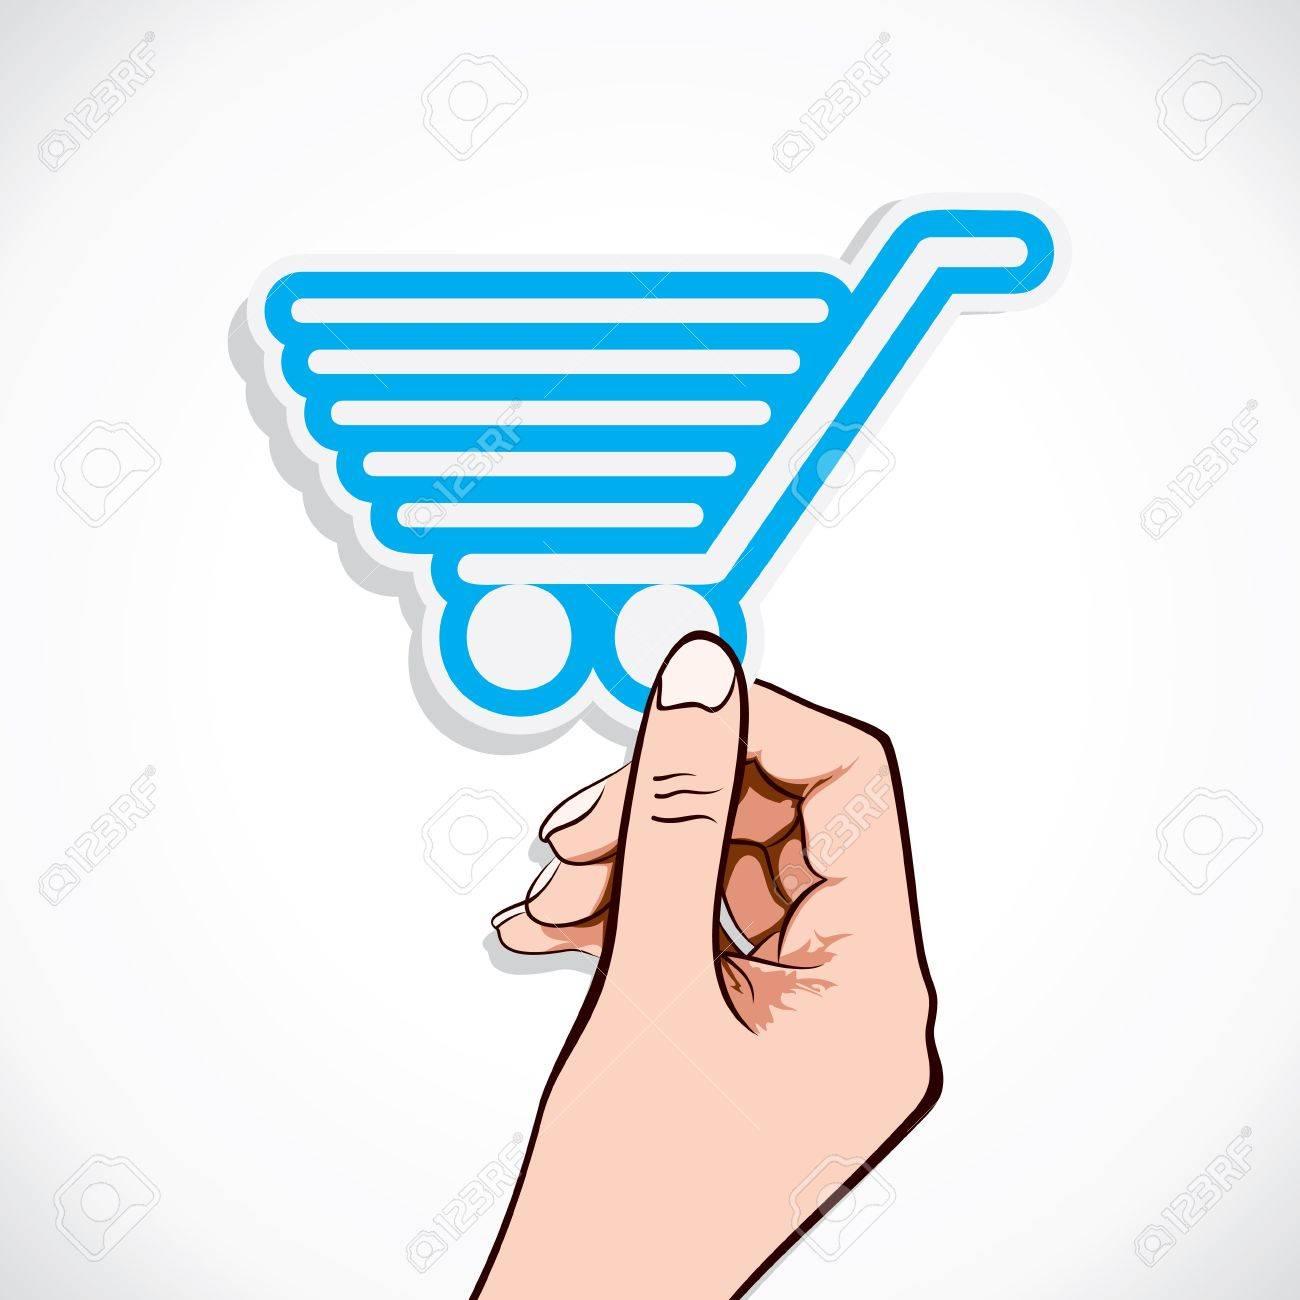 shopping cart sticker in hand stock Stock Vector - 17125706